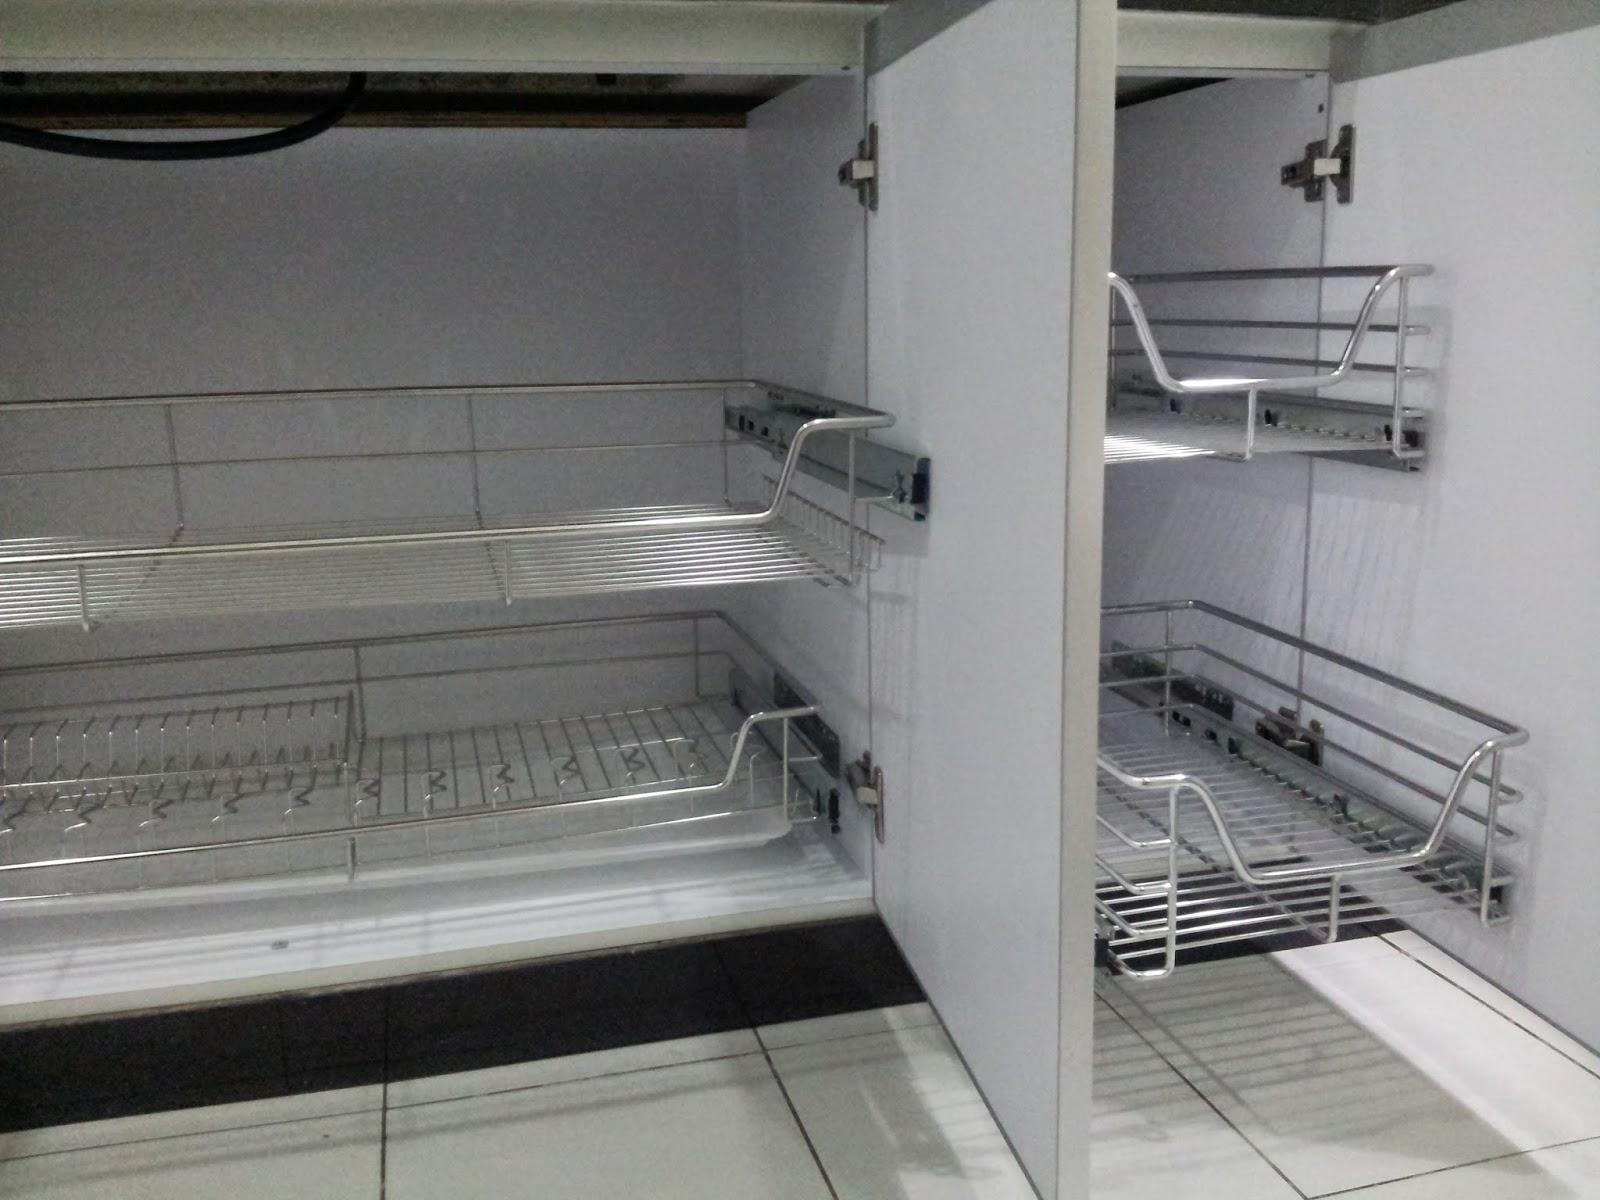 I n t a n o r a z a m b l o g s p o t c o m deco for Jual kitchen set aluminium